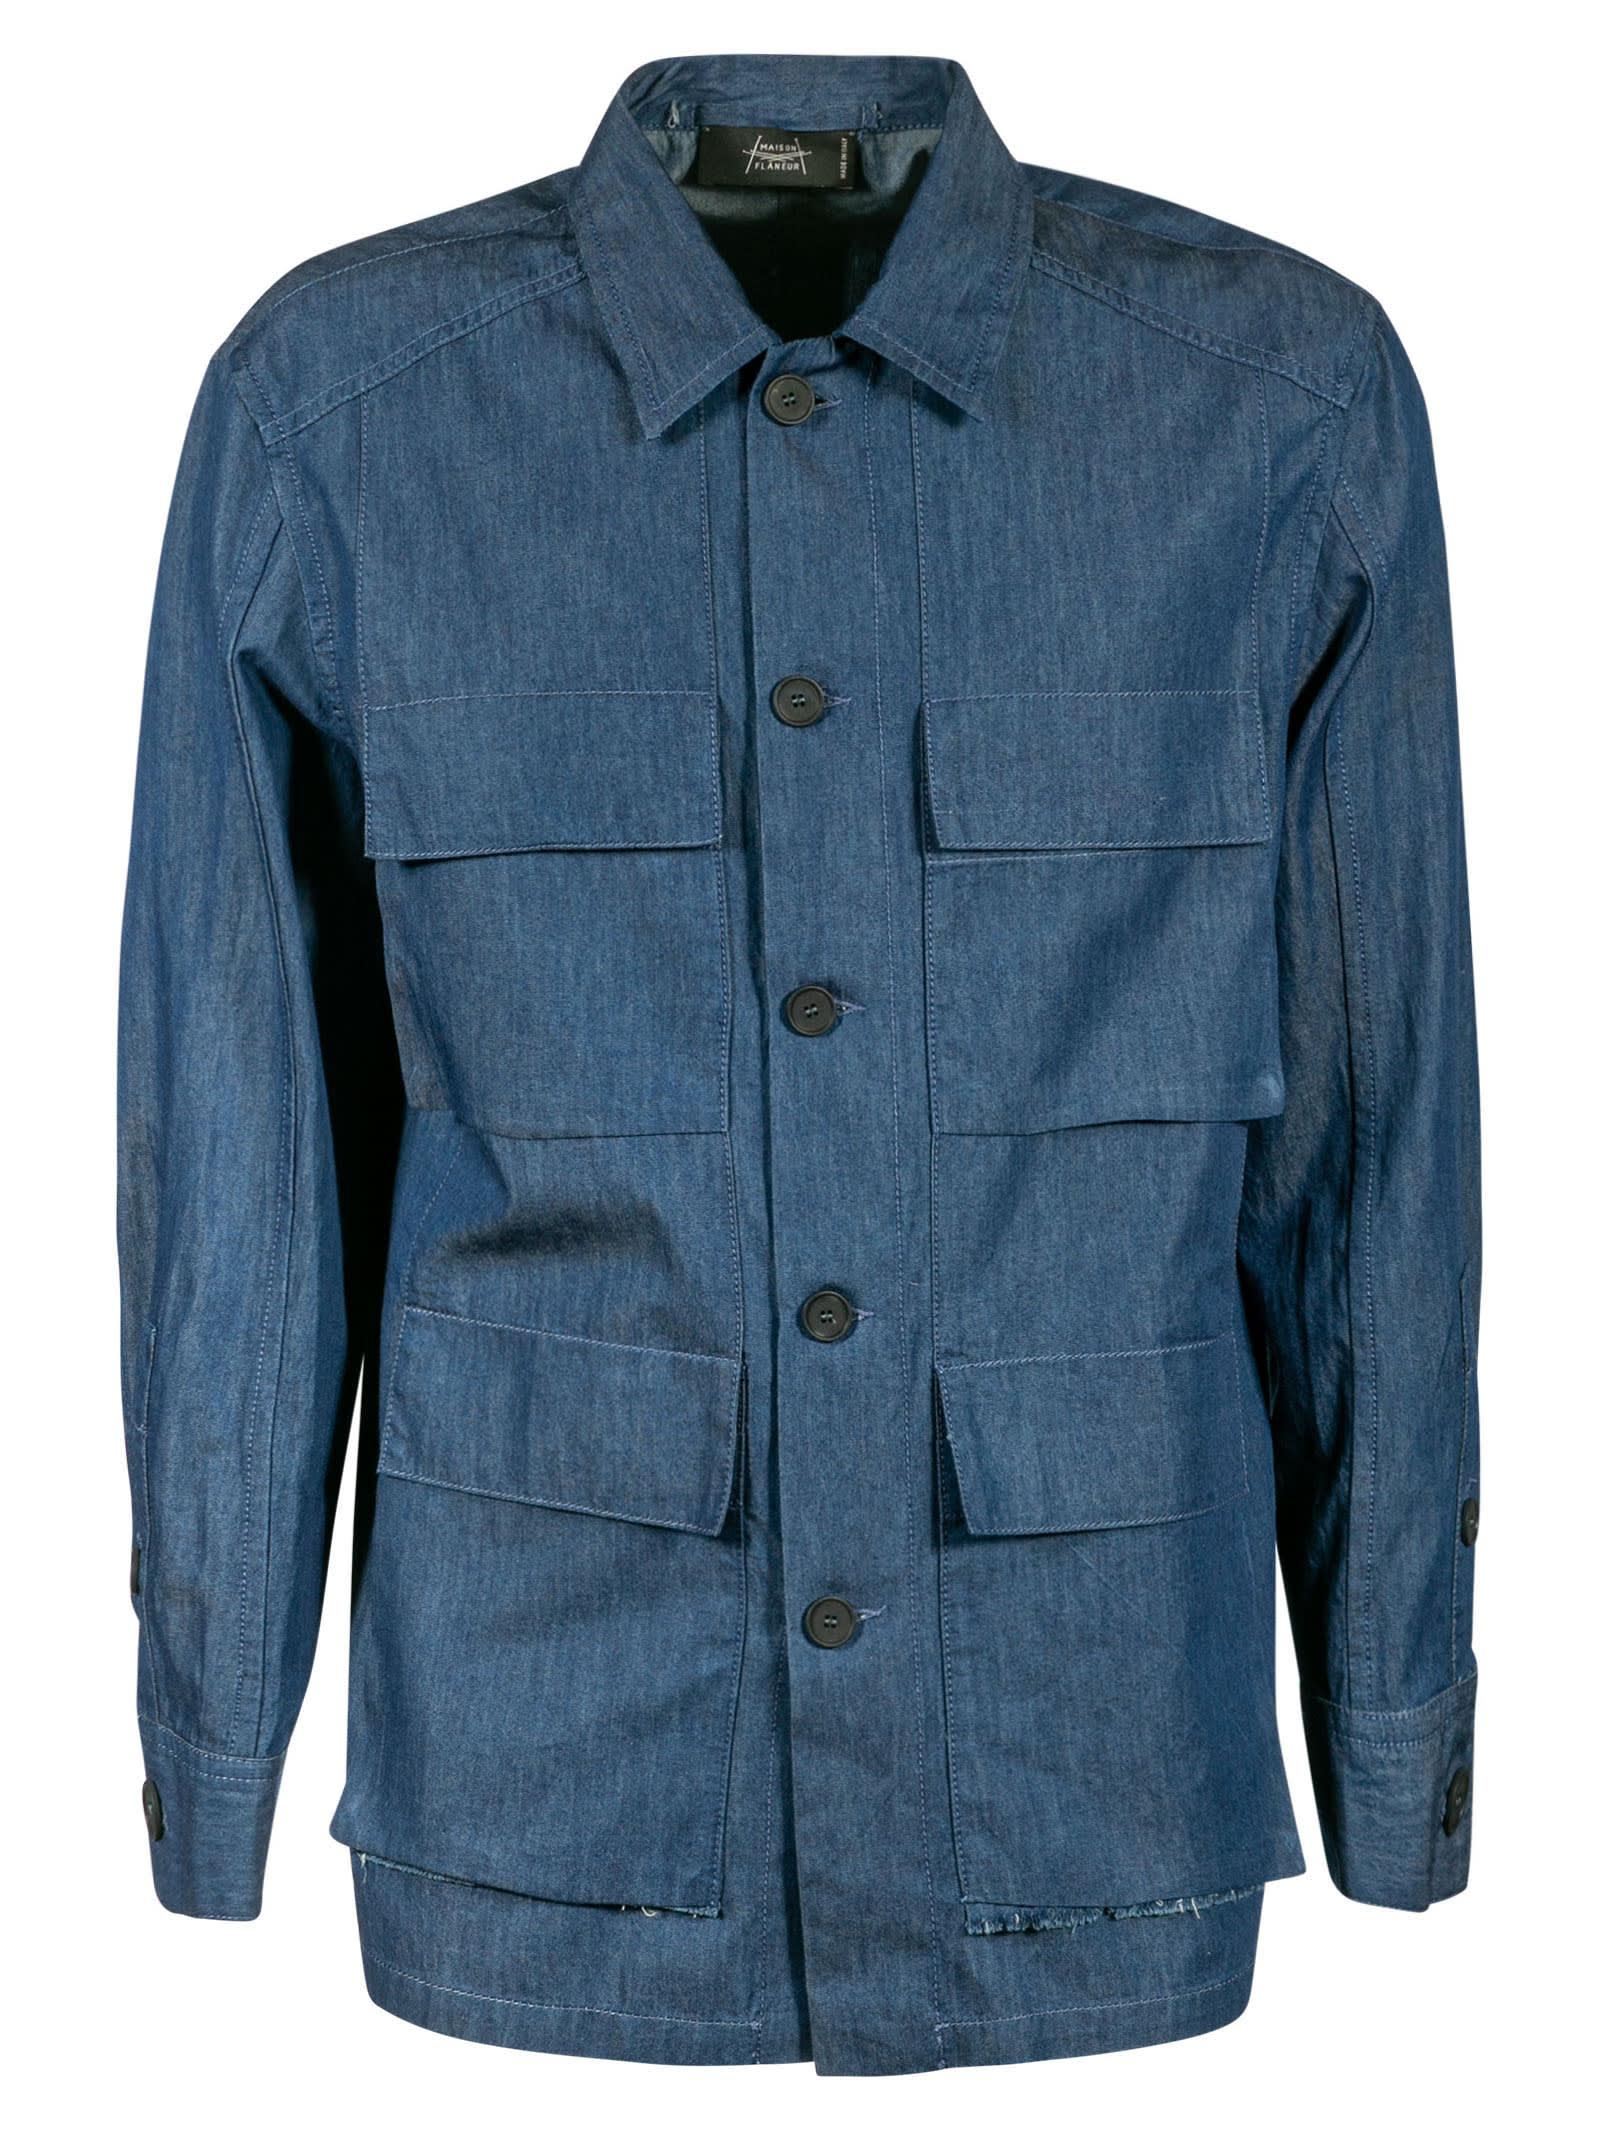 Quad Pocket Denim Jacket